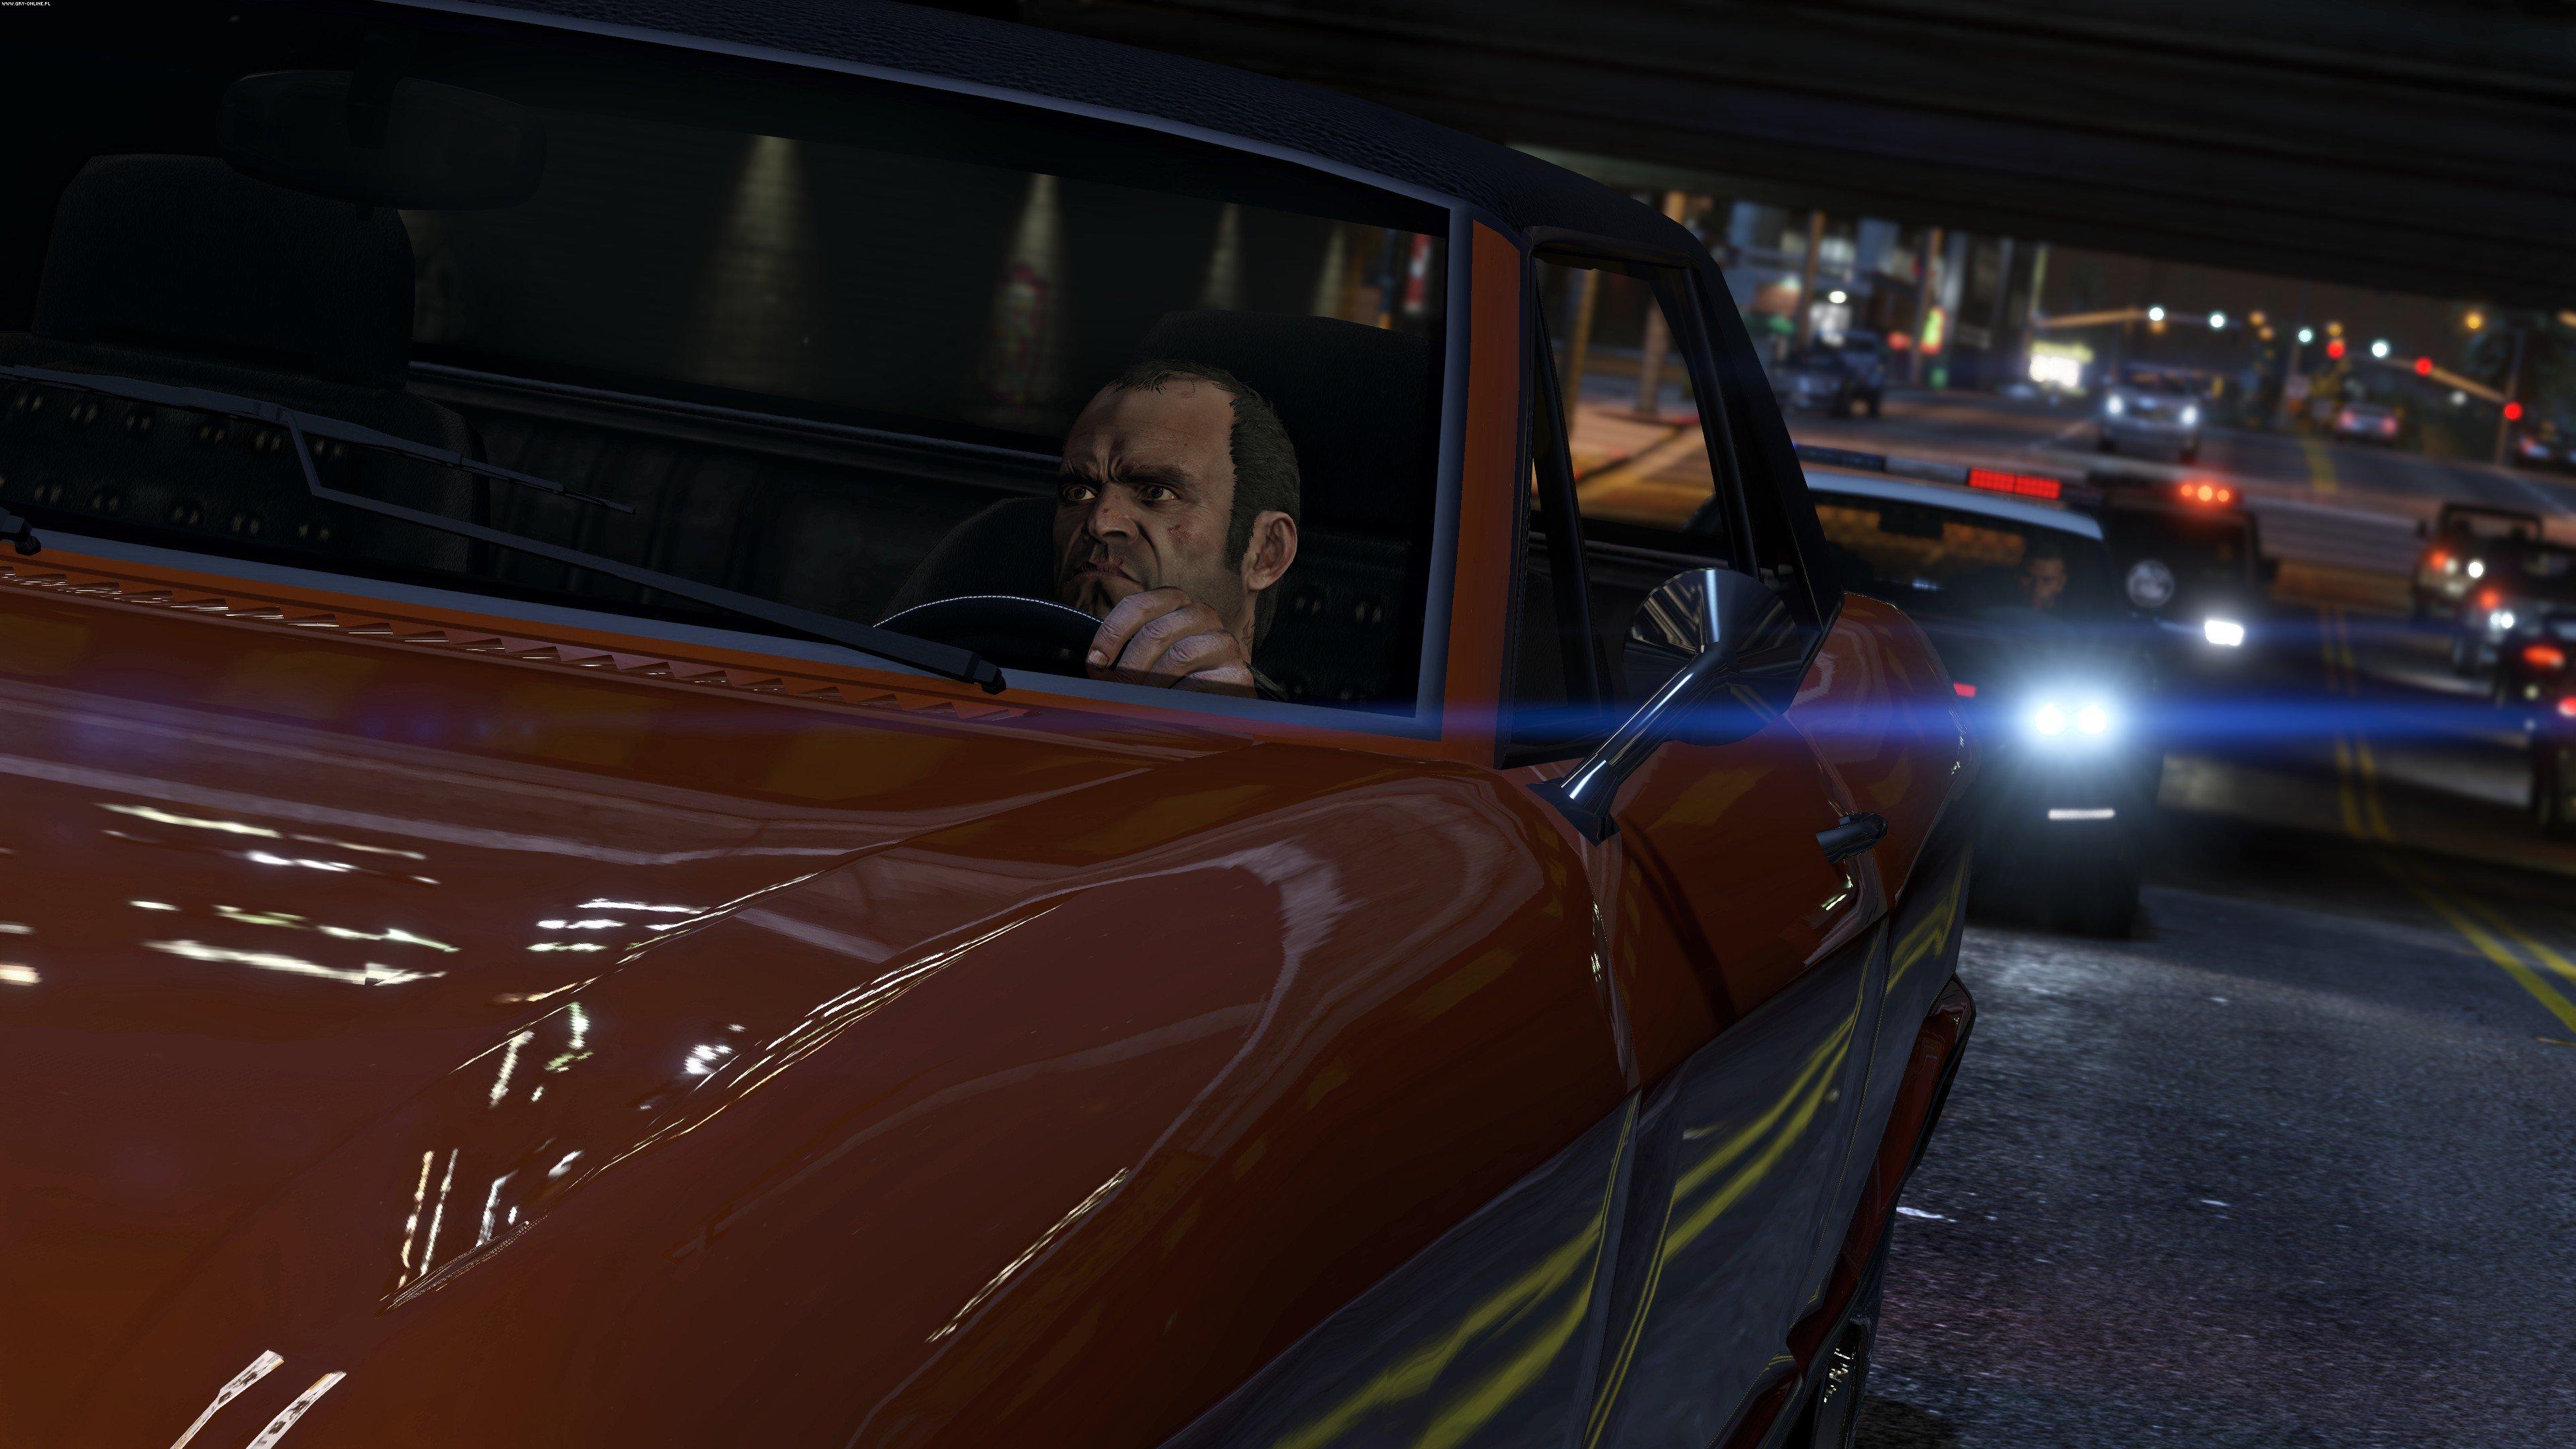 Grand Theft Auto V PC Games Image 8/396, Rockstar Games